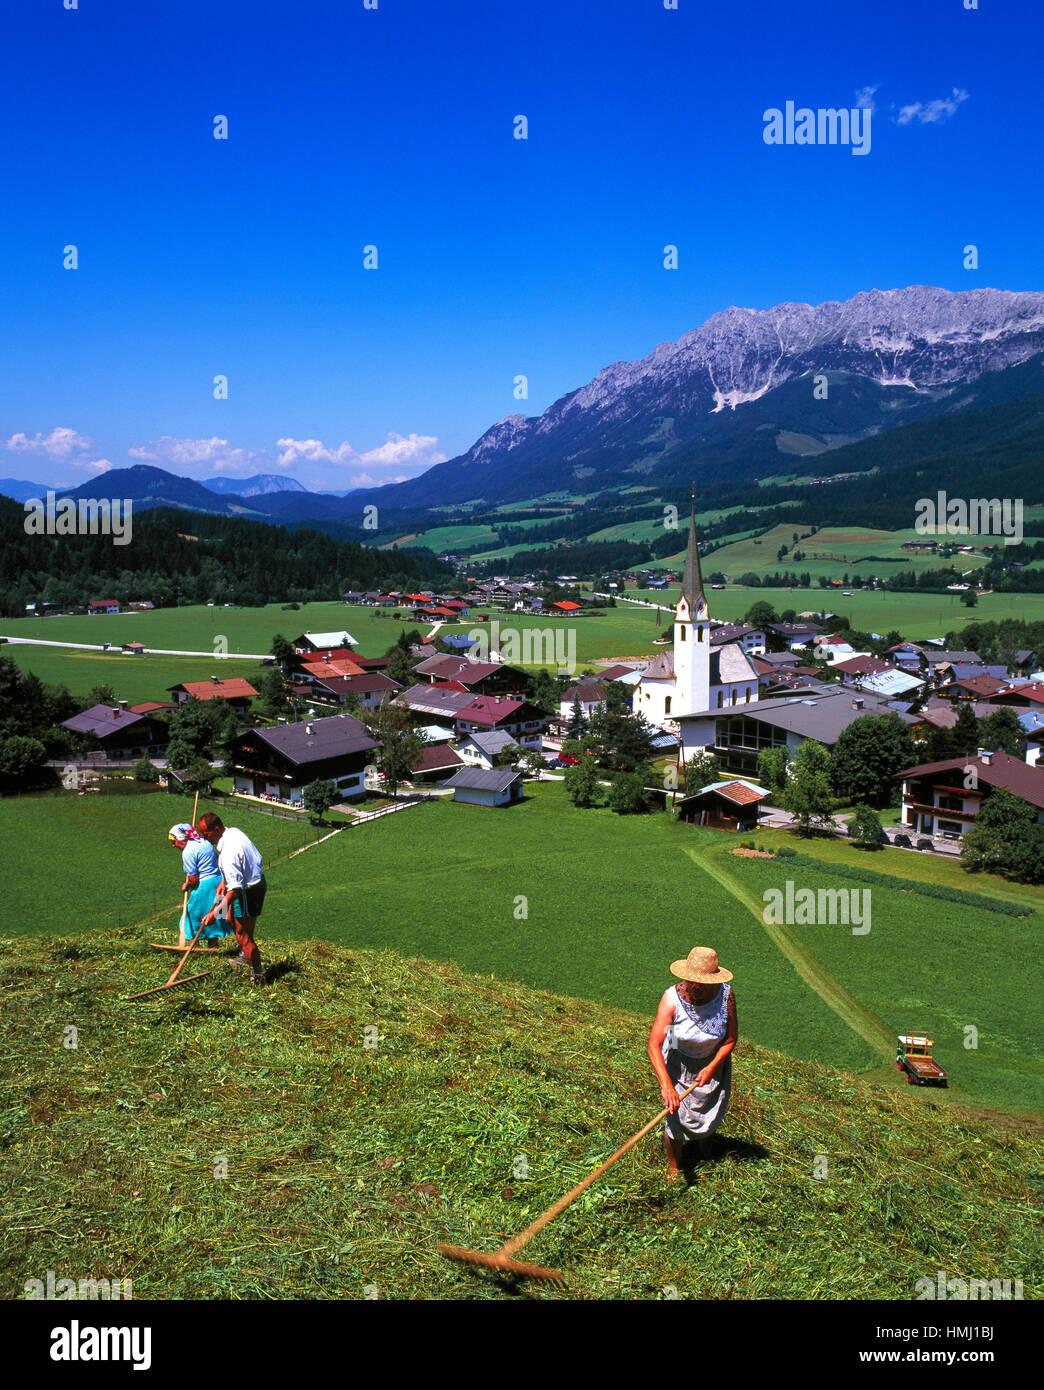 Harvesting in Ellmau village, Tirol, Austria - Stock Image